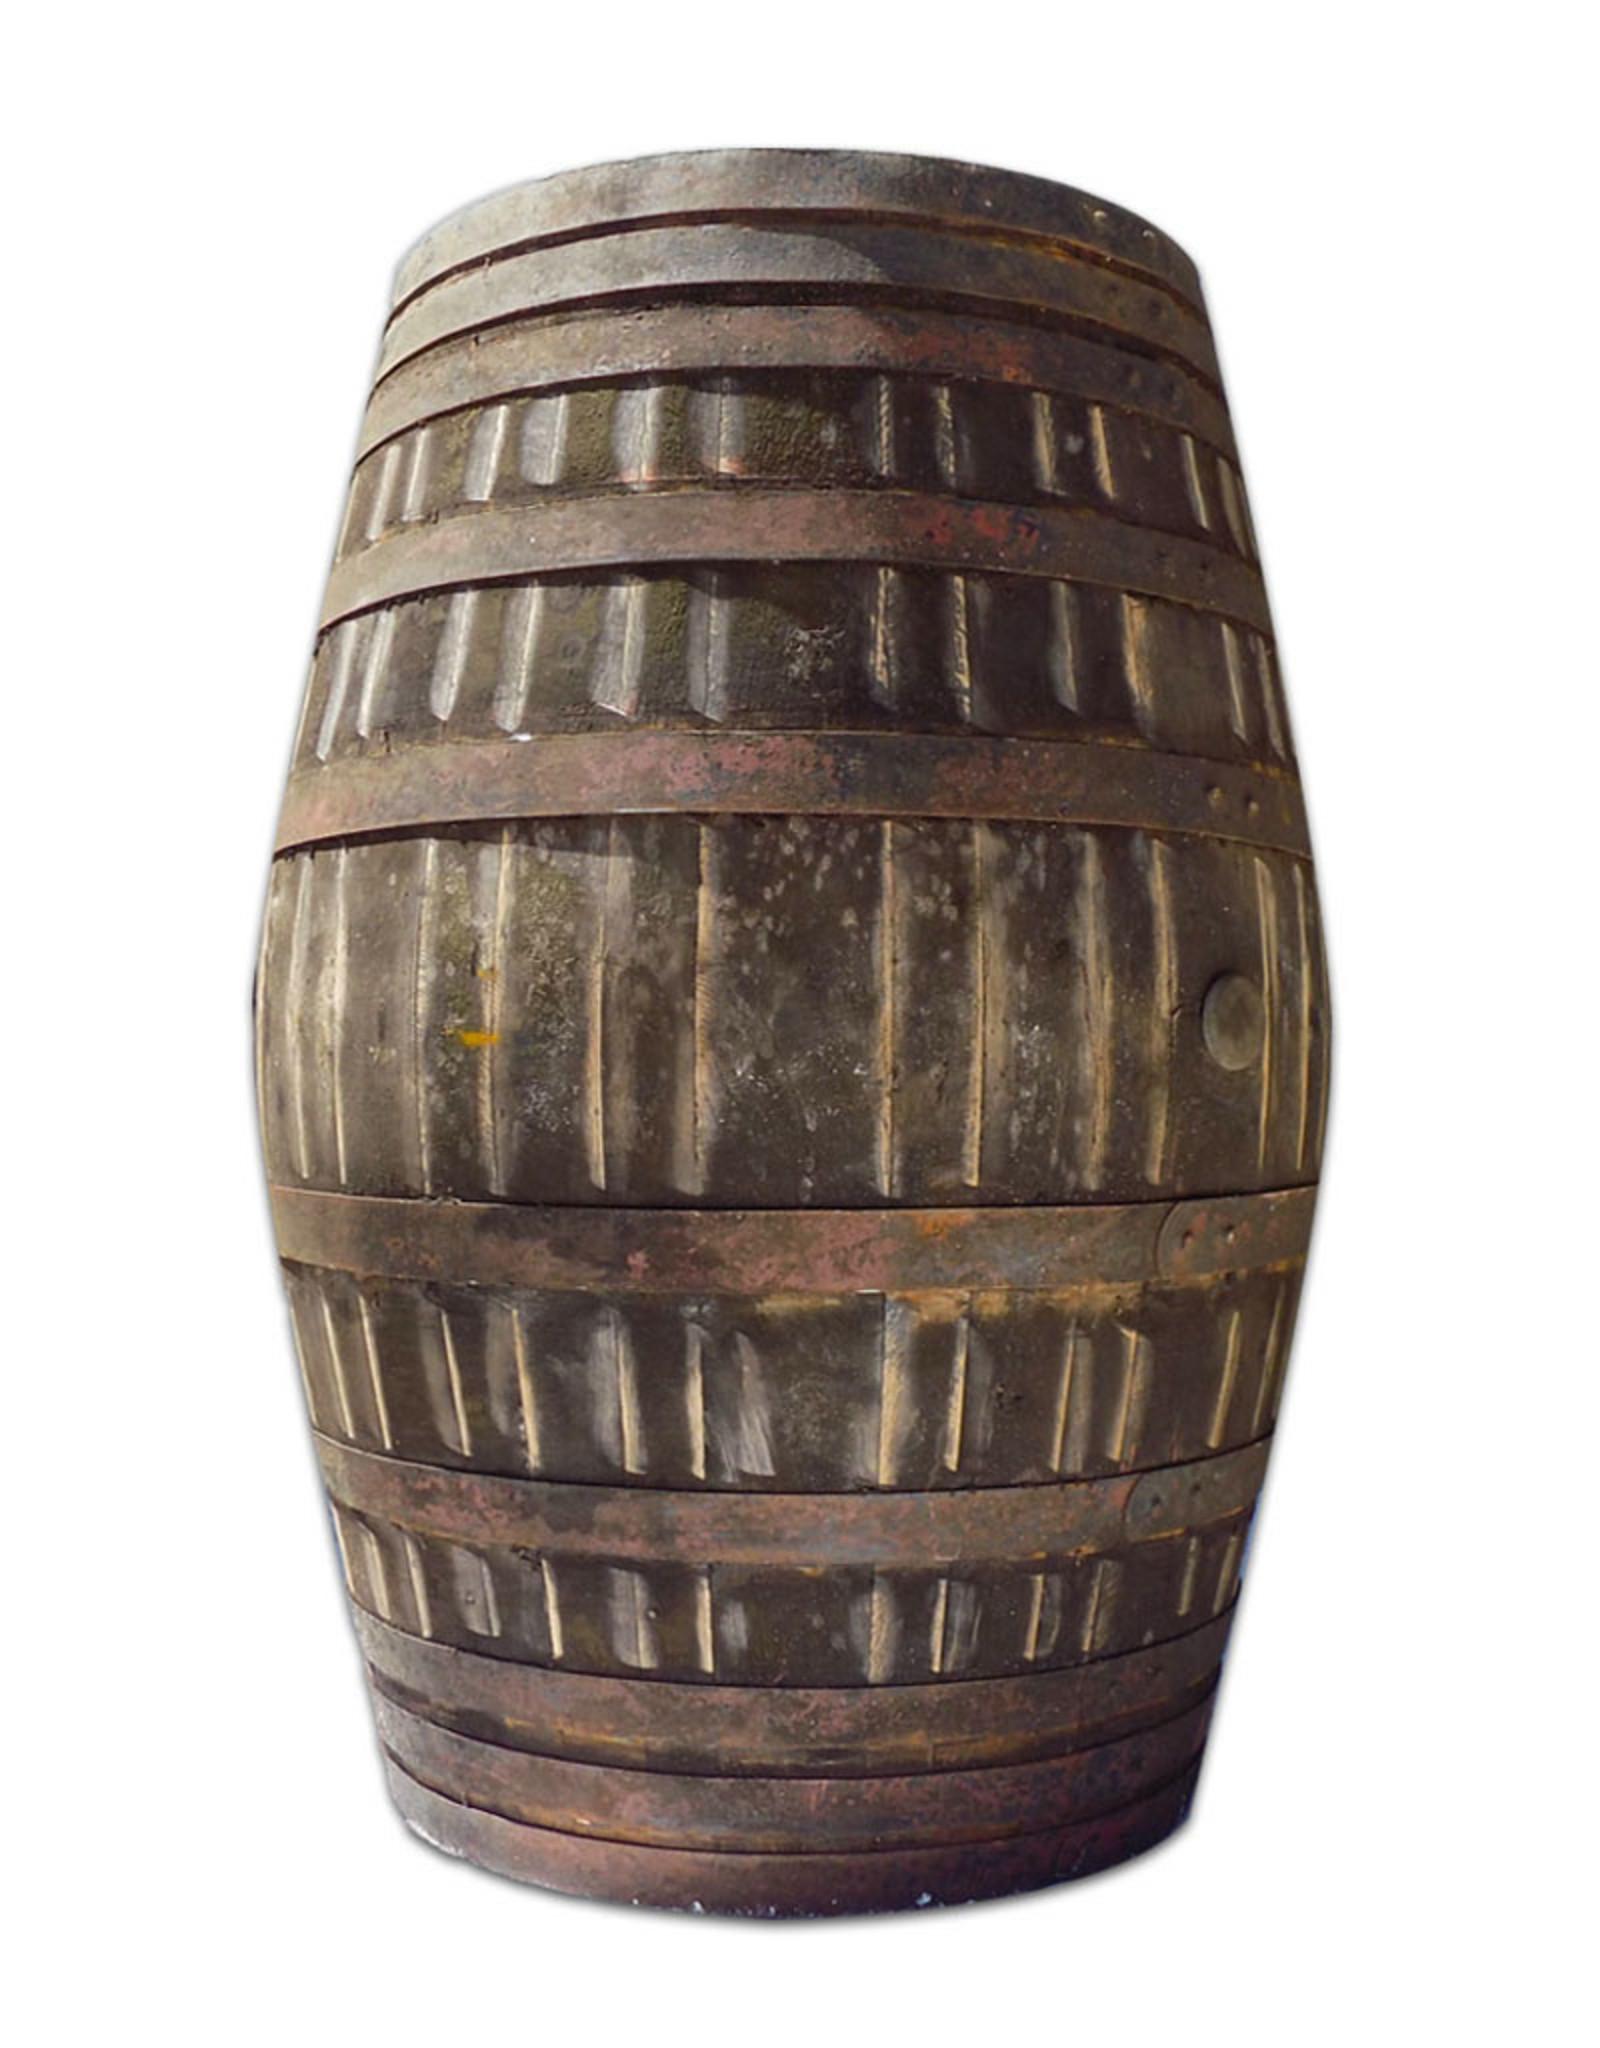 250 L / 500 L OLOROSO SHERRY BARREL SPANISH OAK - 30 YEARS